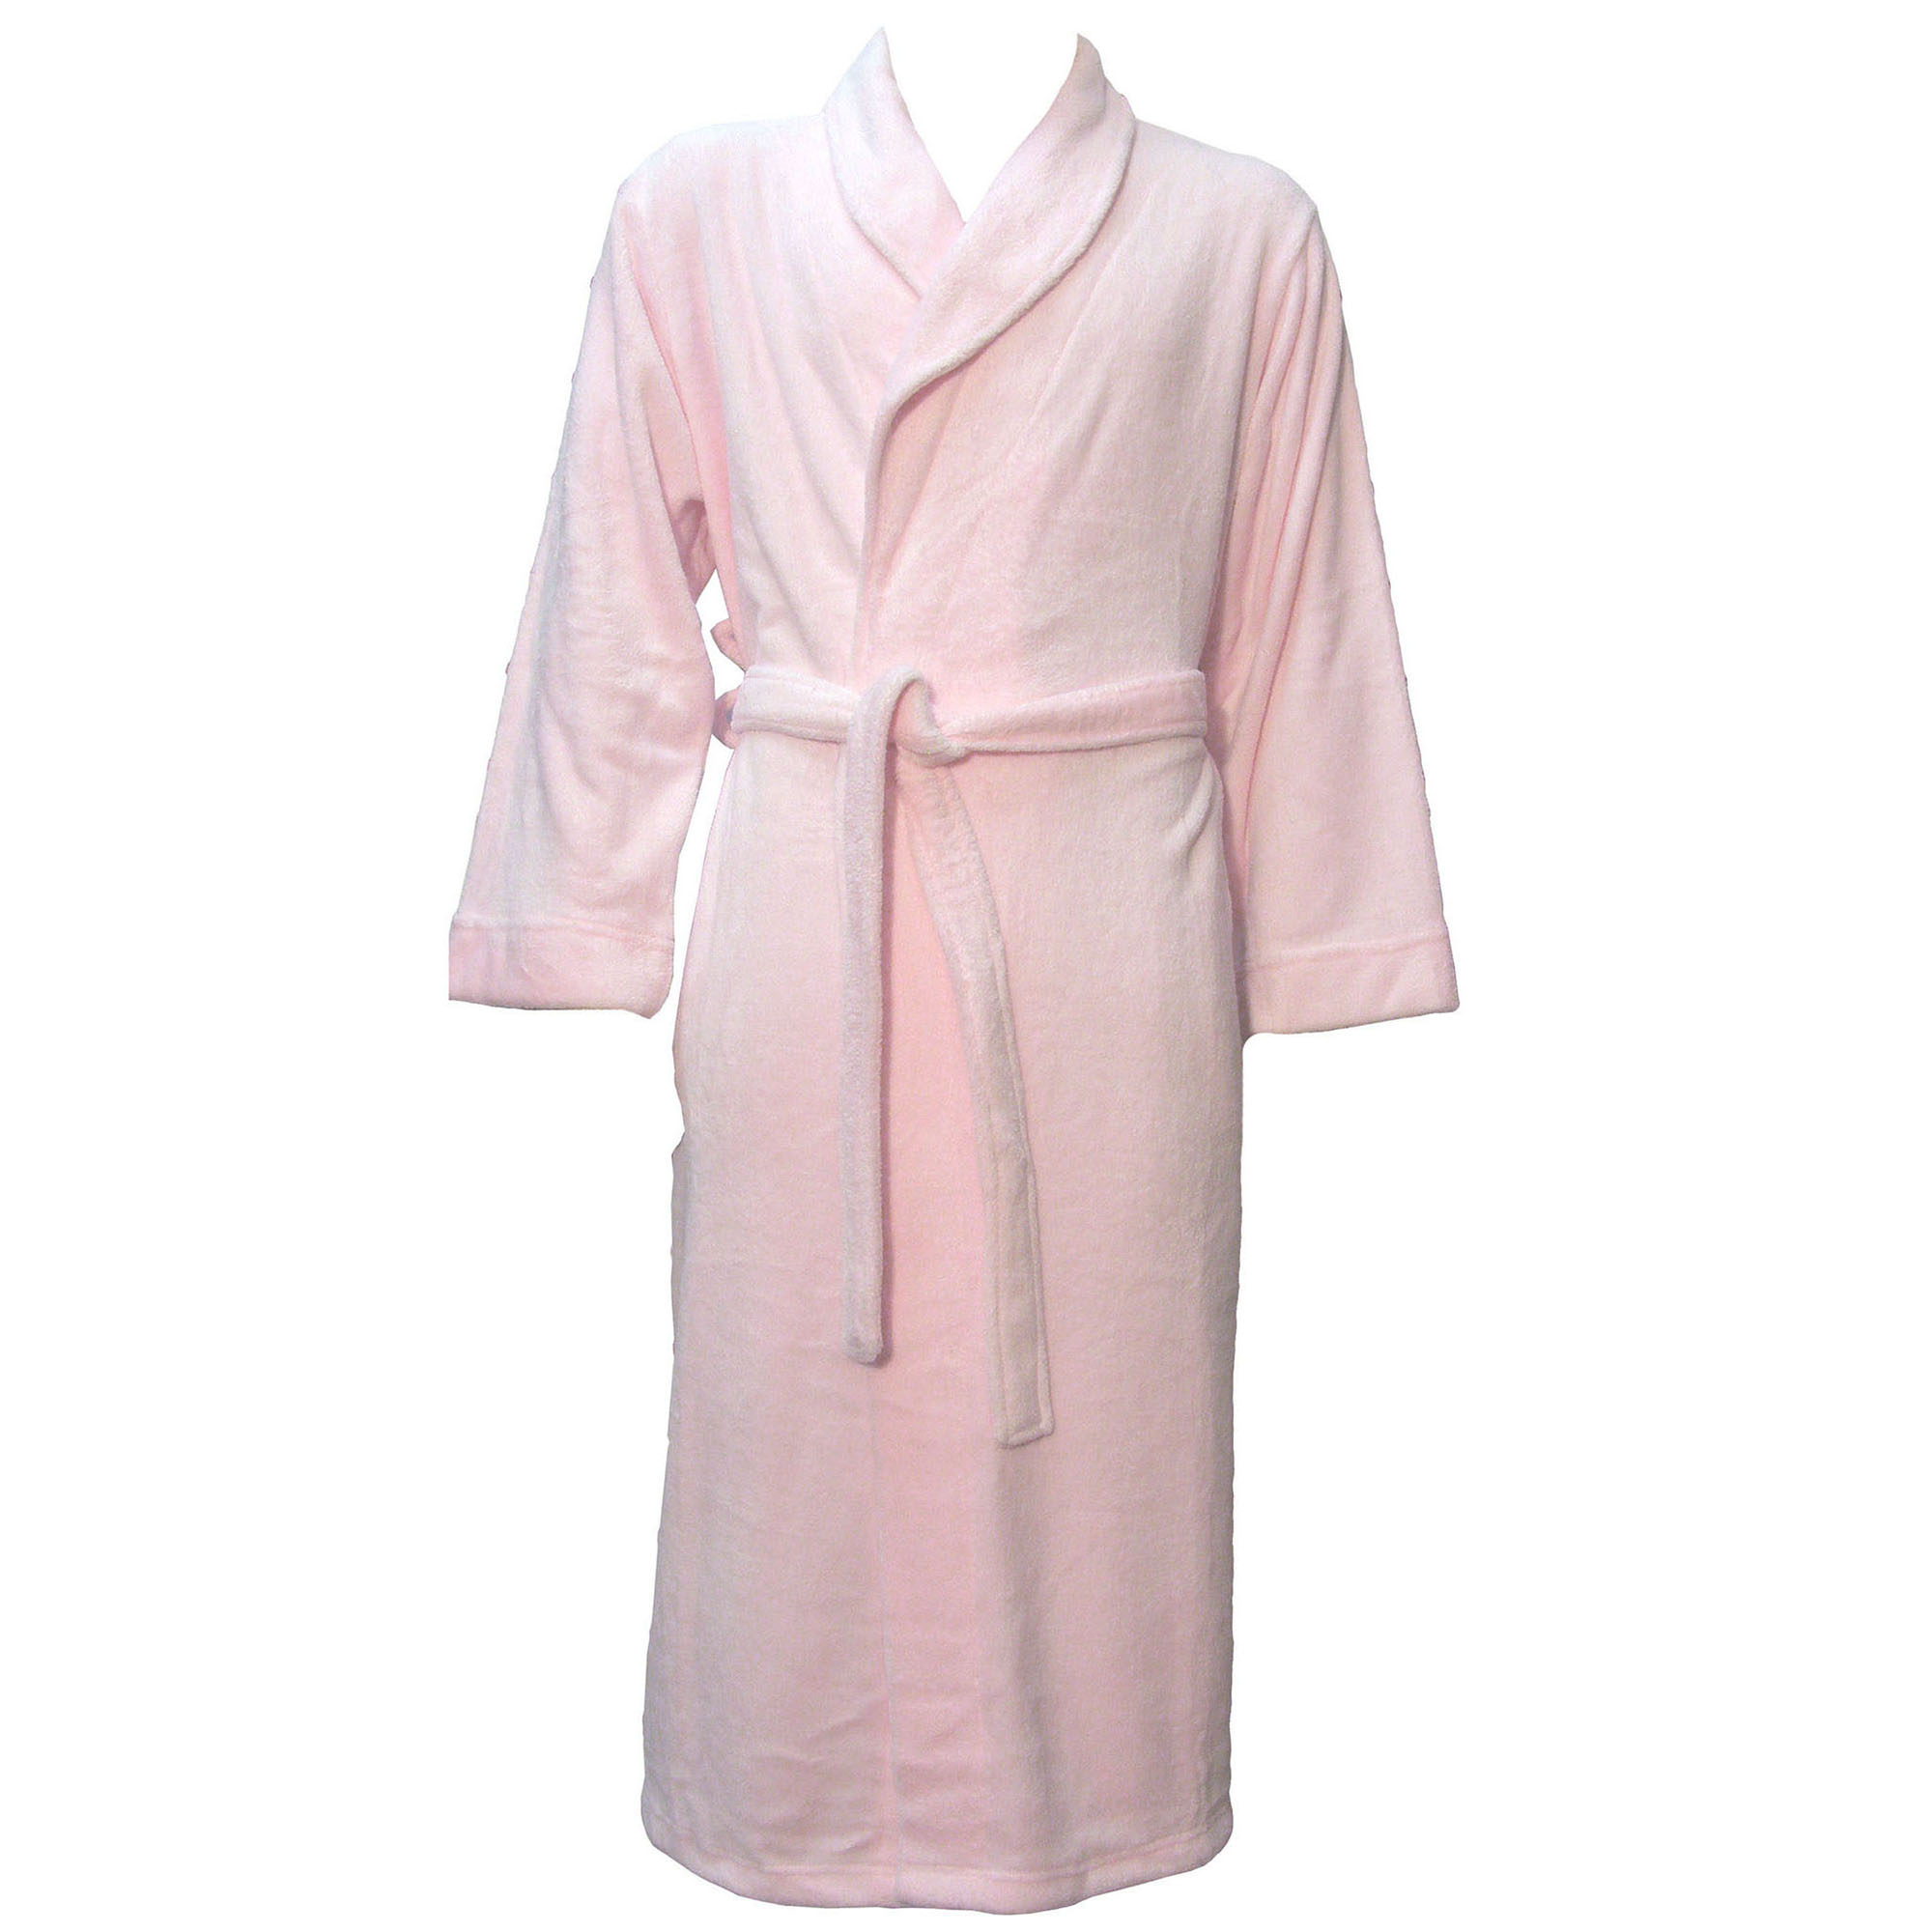 Warm Plush Spa Hotel Kimono Bath Robe Bathrobe for Women and Men Pink by